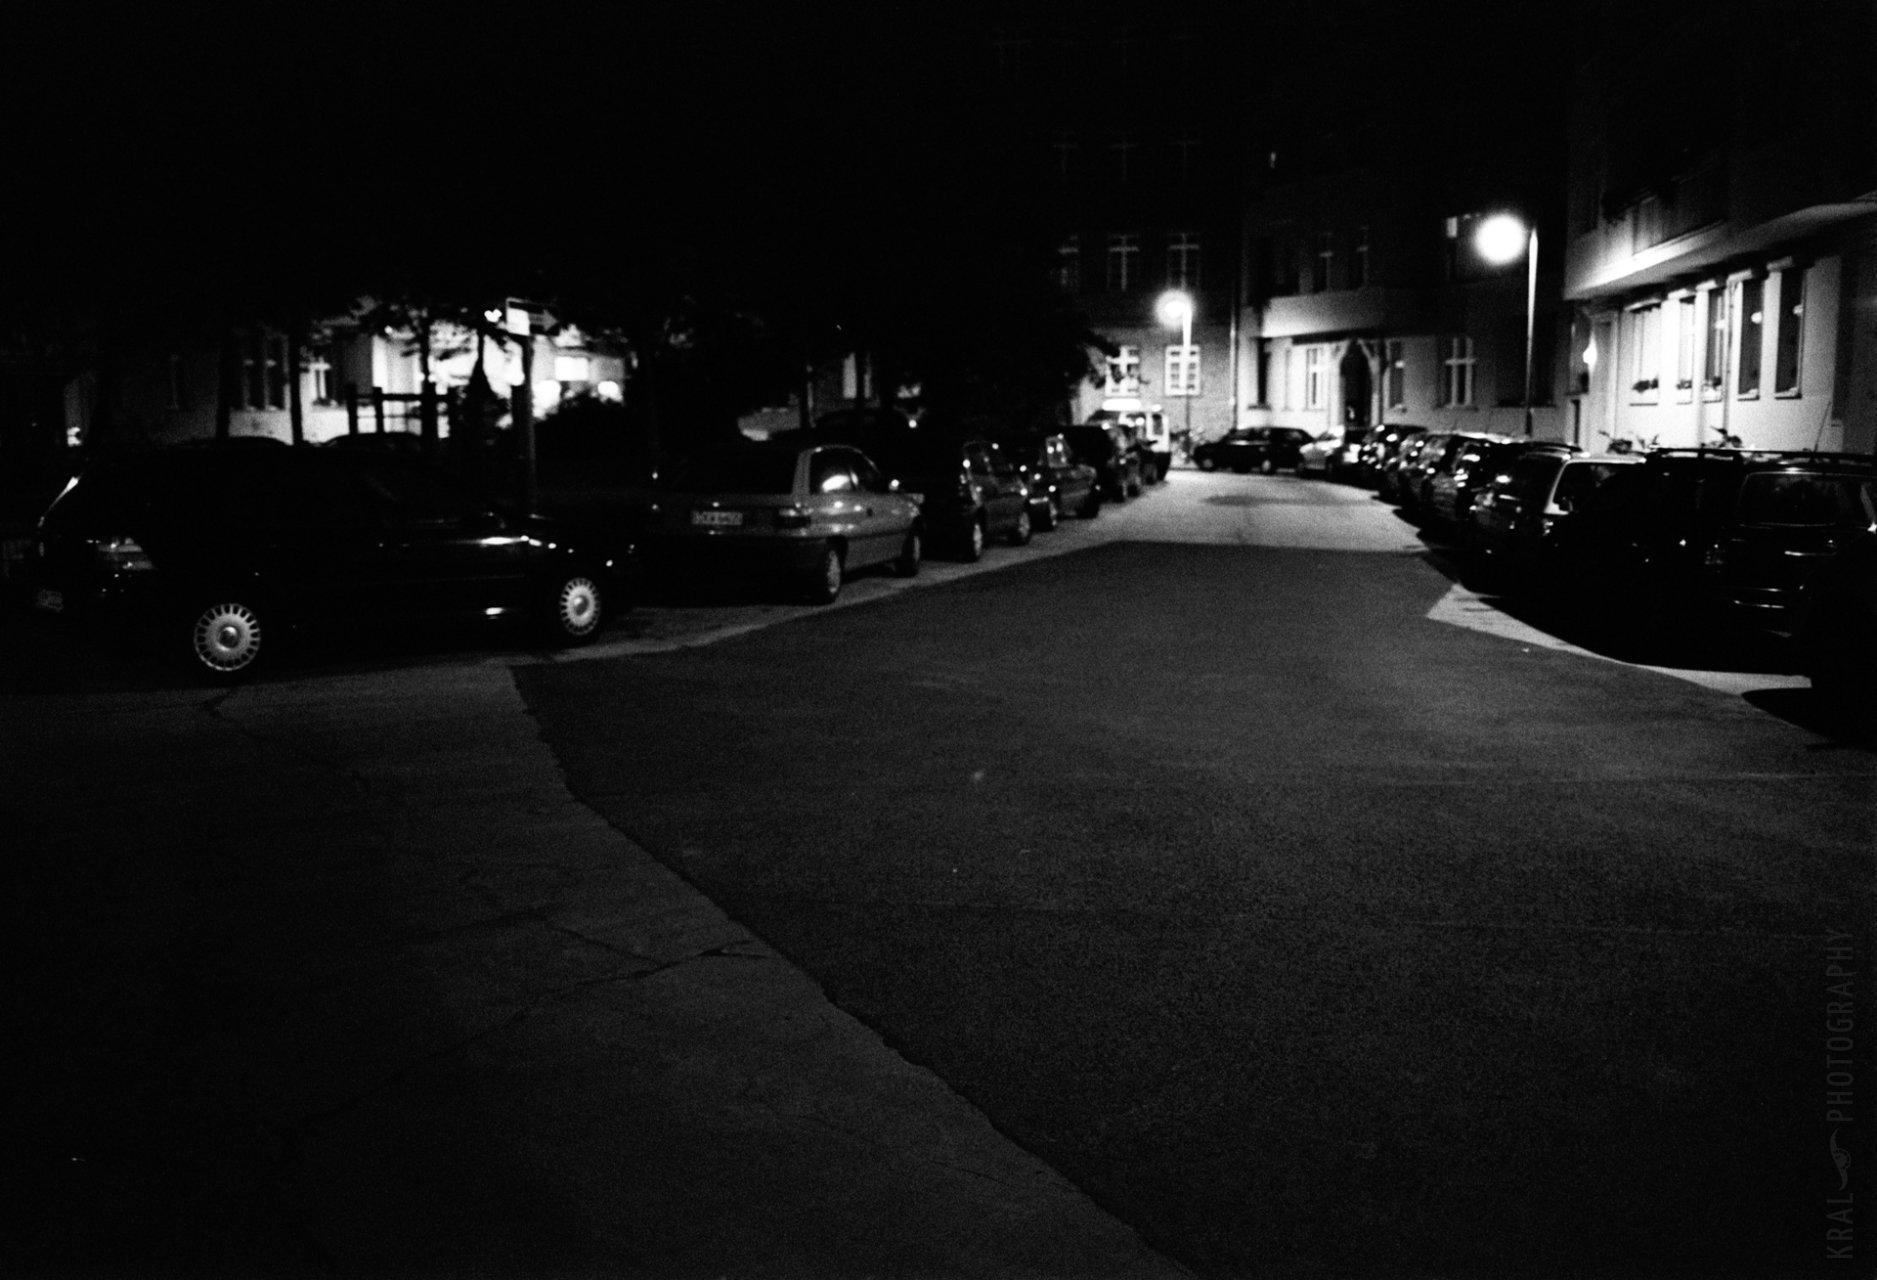 © Holger Kral • Photography - 01_qp_ok_01_08 - 2005, berlin, blackwhite, city, night, quiet, street, summer - photo #1